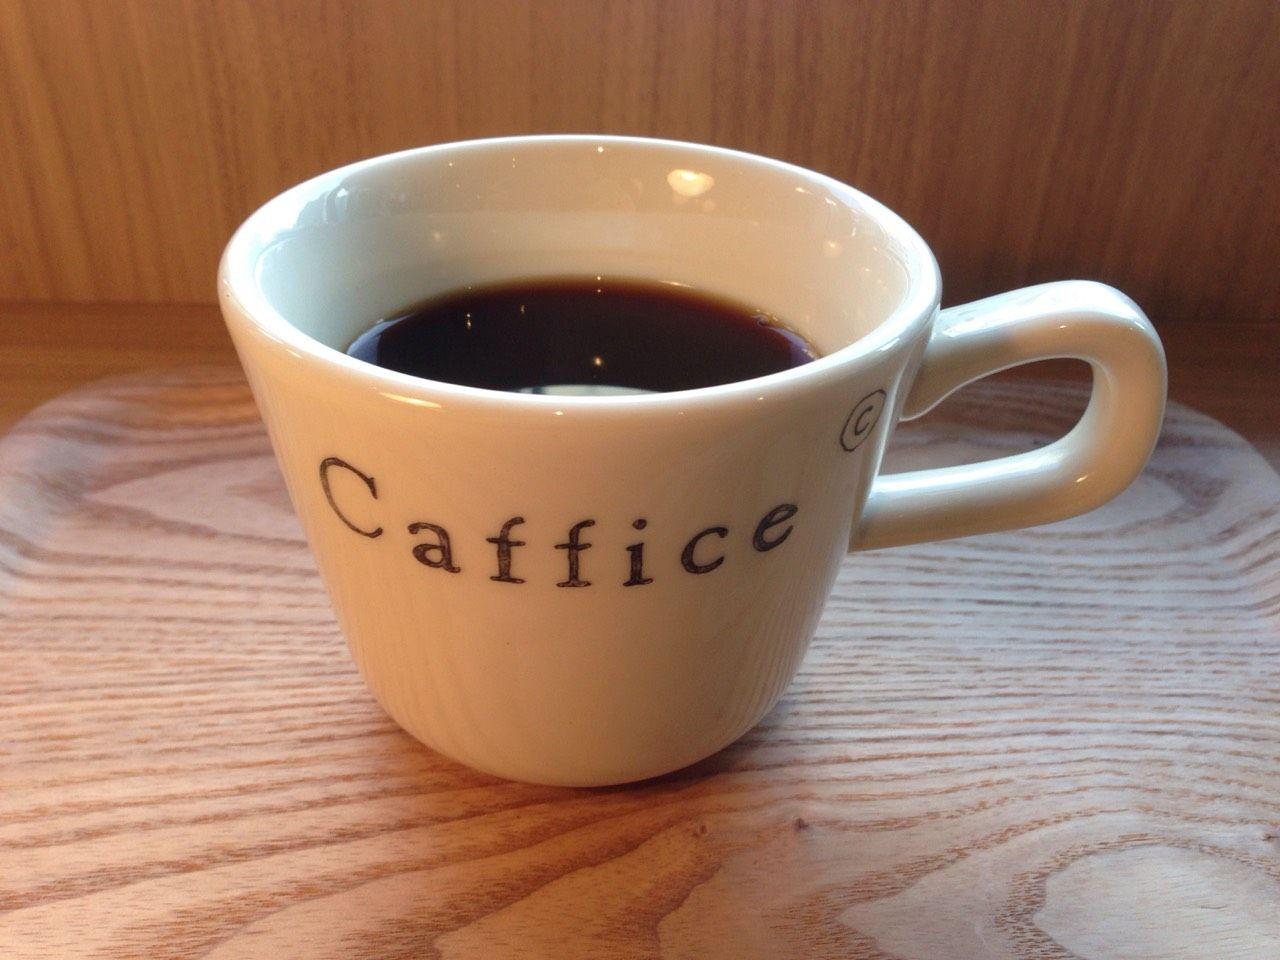 NHN PlayArtがカフェ事業に参入 新宿三丁目に「Caffice」をオープン